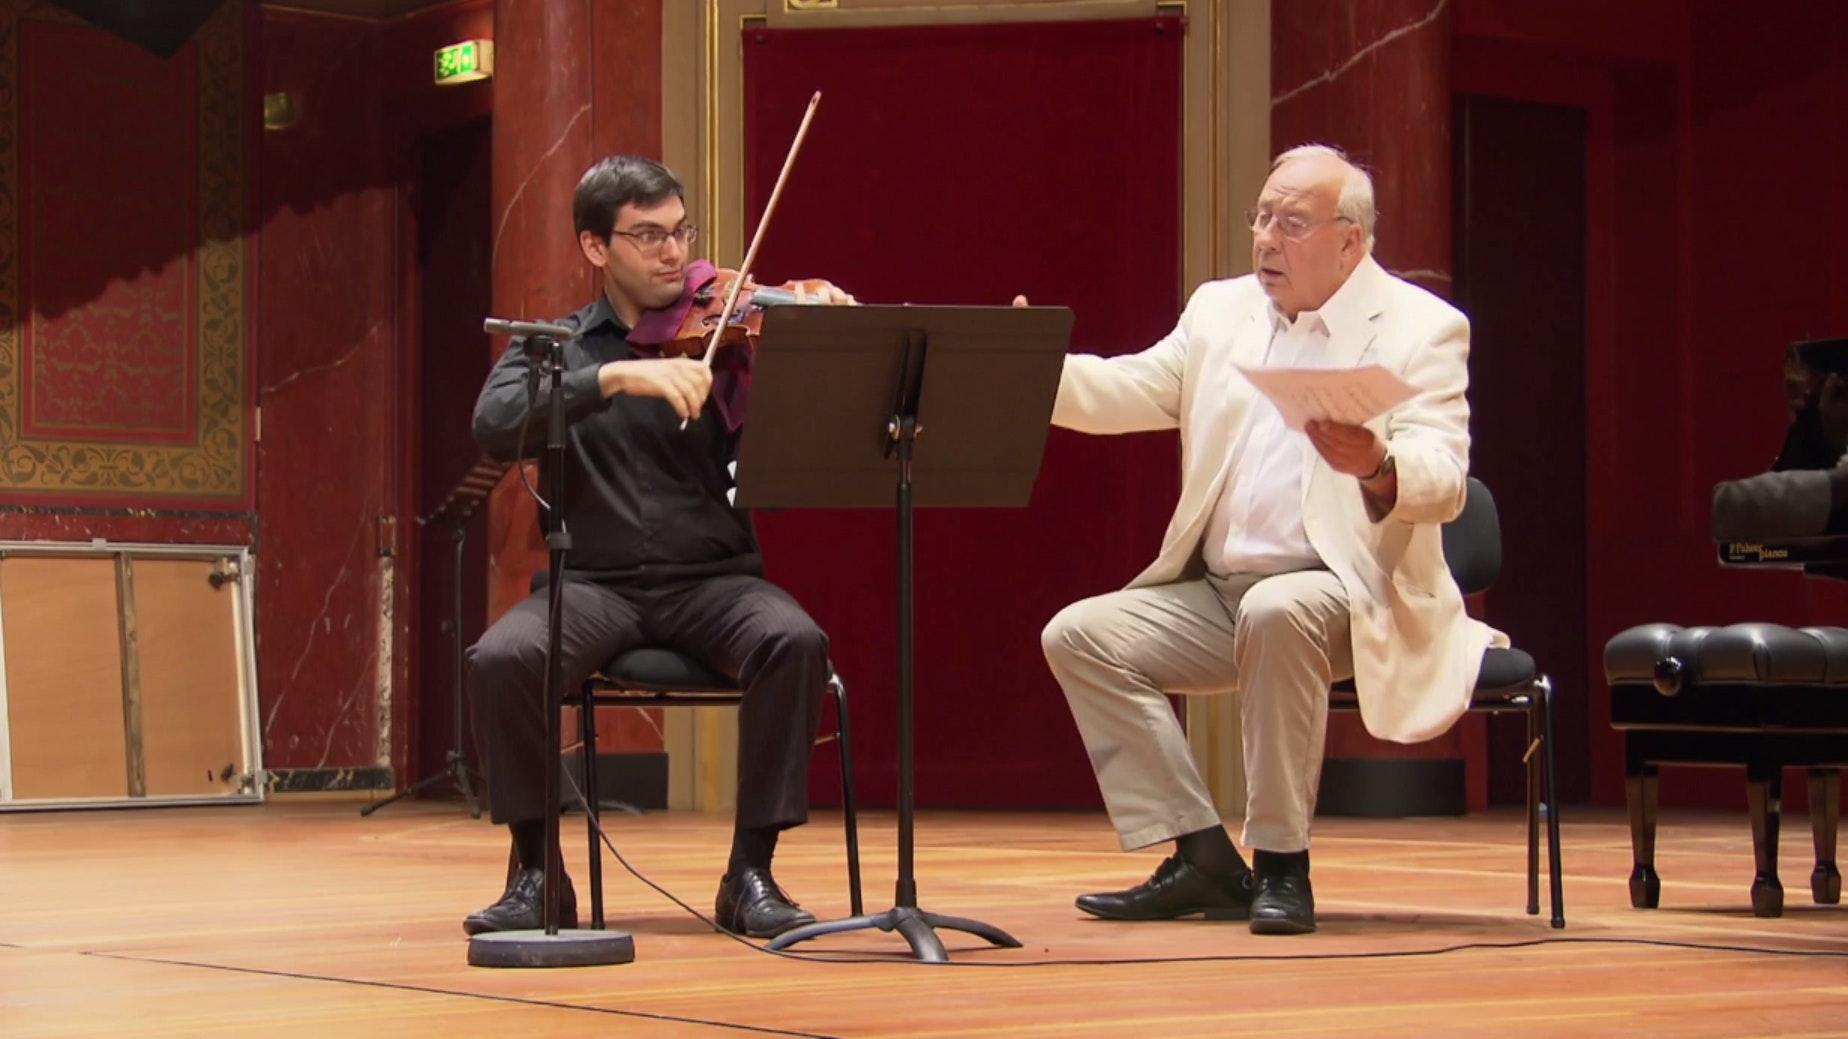 Horn, Violins, Bassoon, the Orchestre de la Suisse Romande is hiring